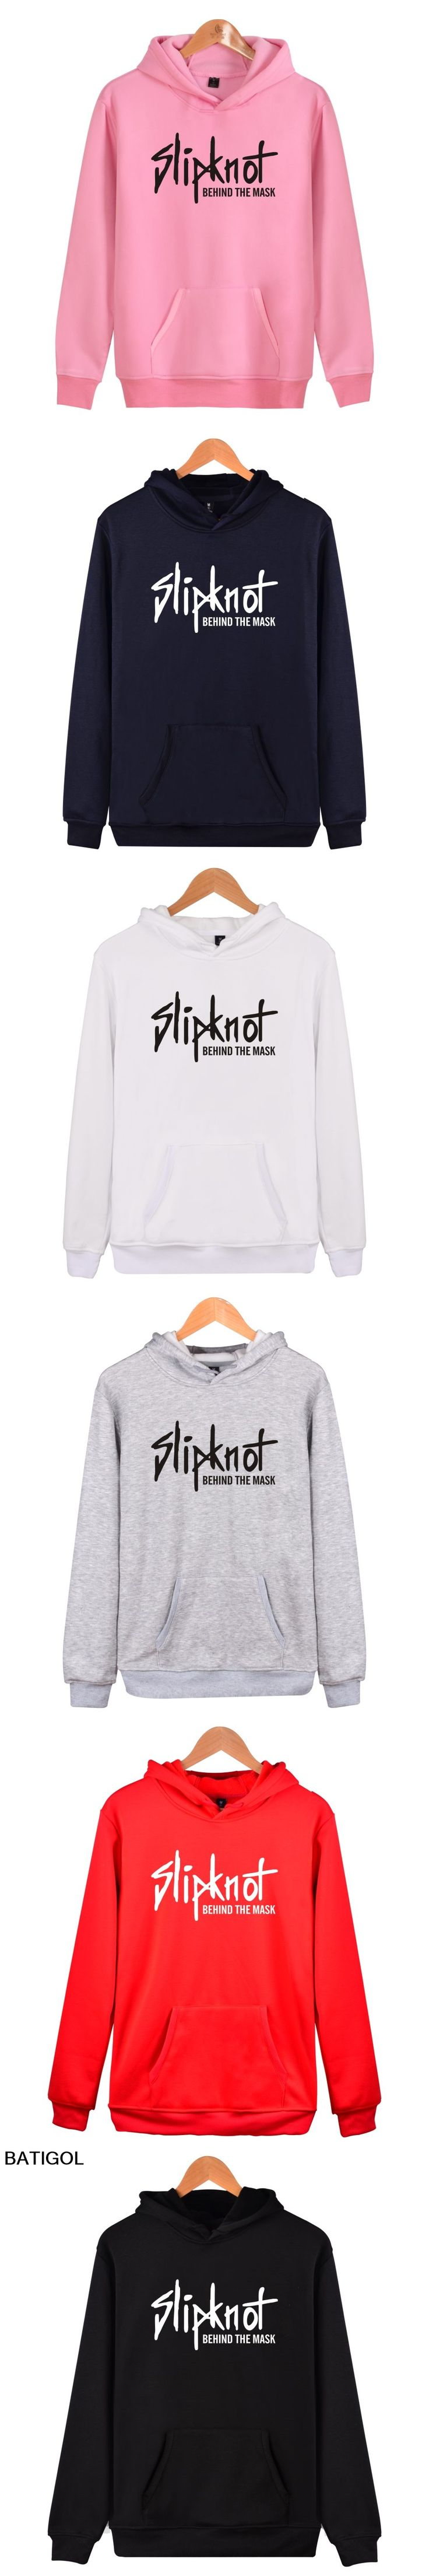 BATIGOL 2017 Slipknot Rock Band Heavy Metals Hoodies Fashion Kpop Men Cap Hooded Sweatshit Leisure Clothes Plus Size XXXXL